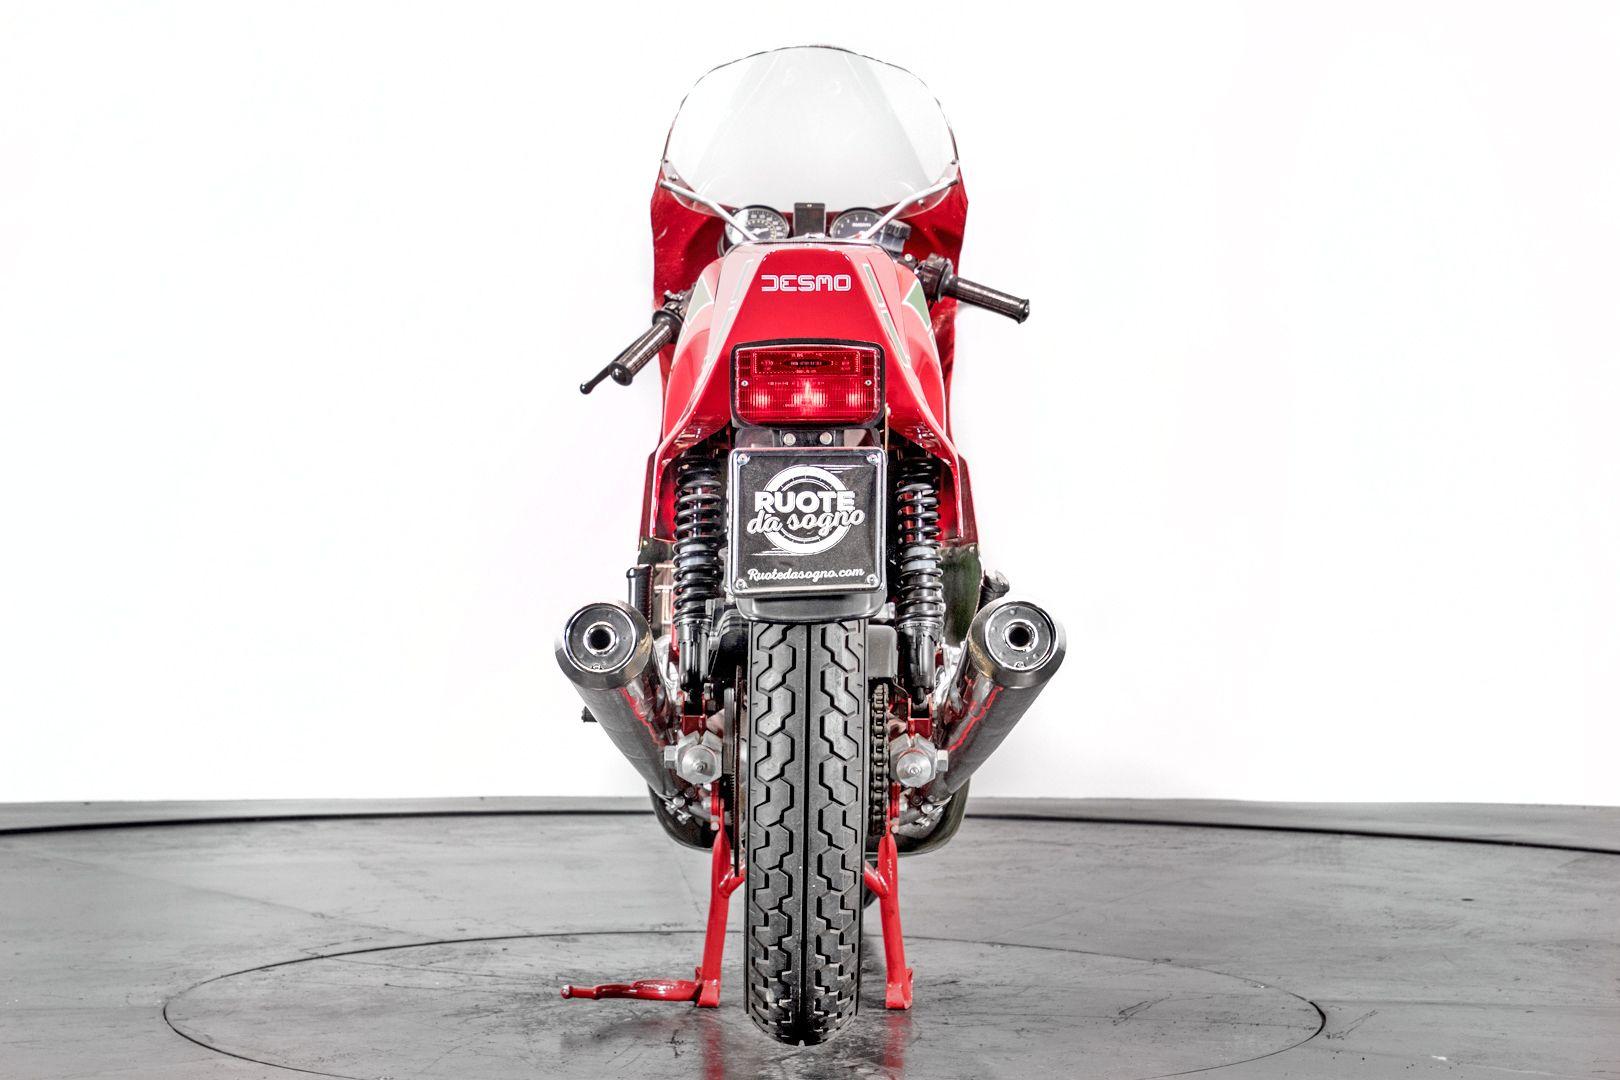 1984 Ducati 900 Mike Hailwood Replica 81547